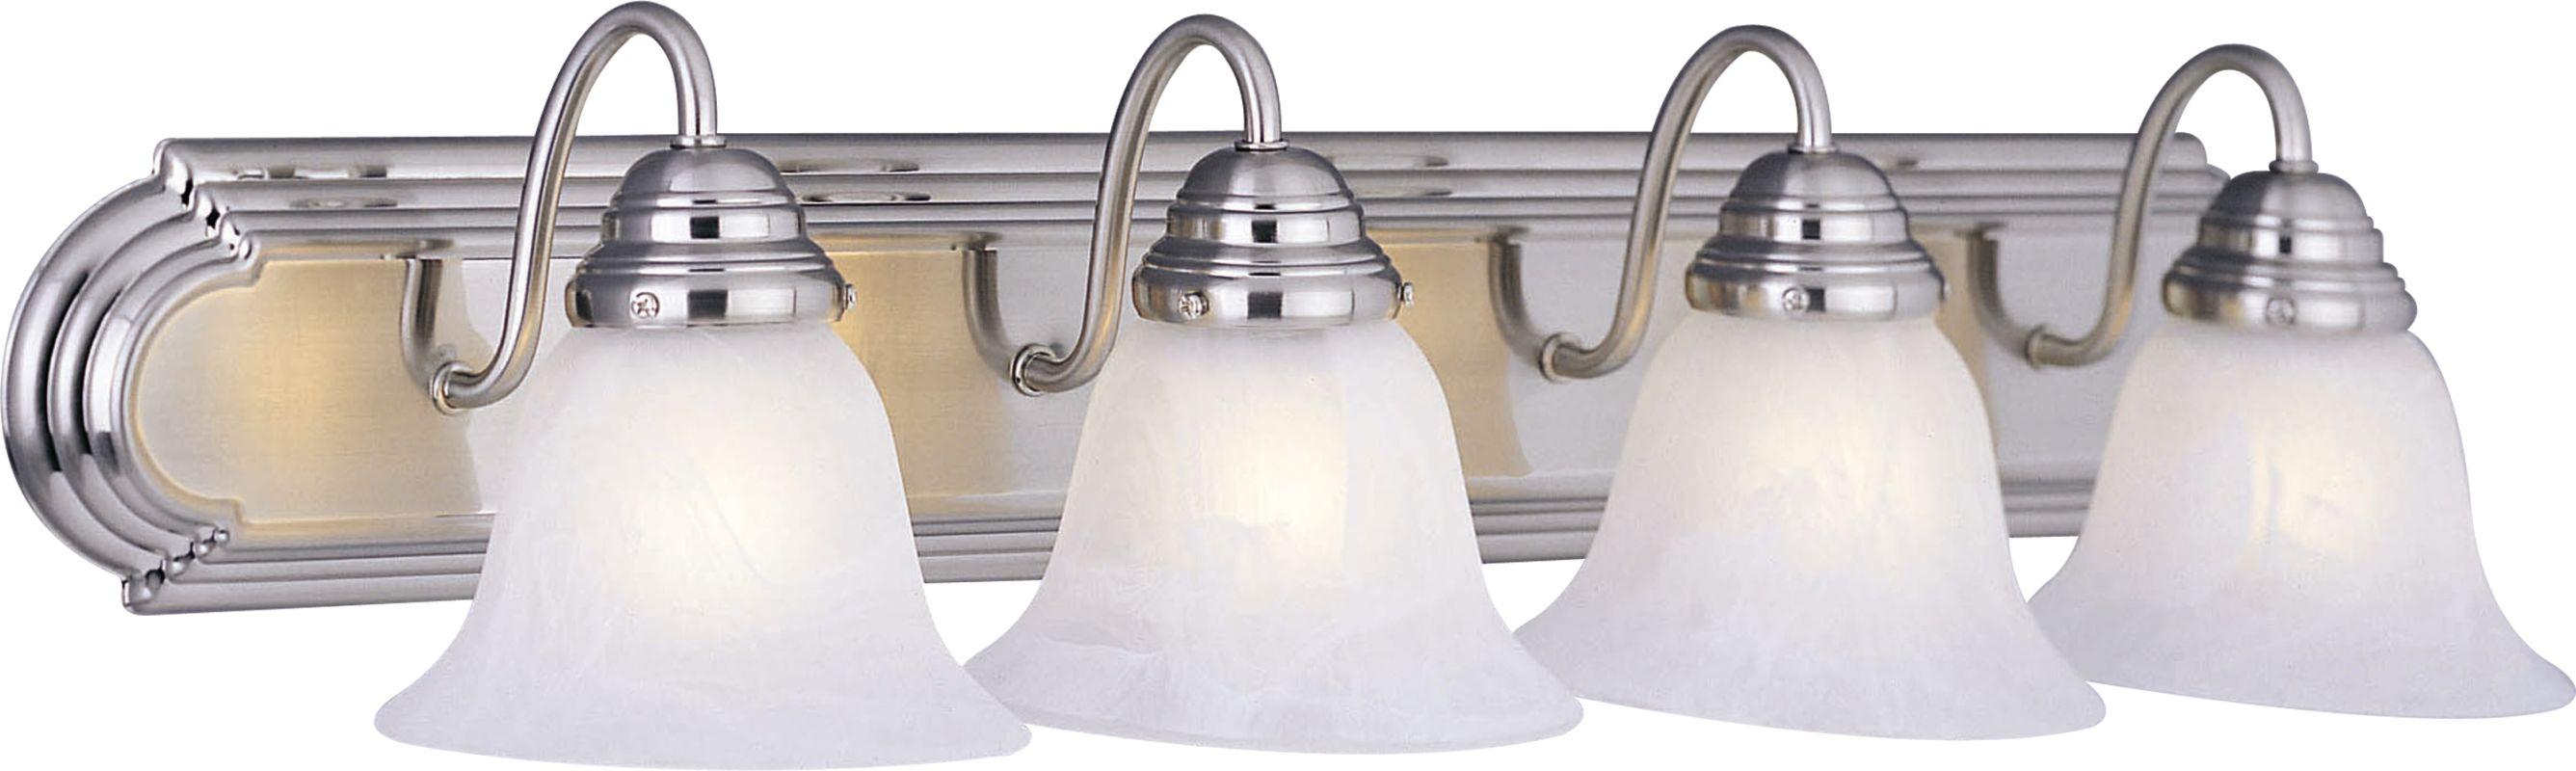 "Maxim 8014 4 Light 30"" Wide Bathroom Fixture from the Essentials -"